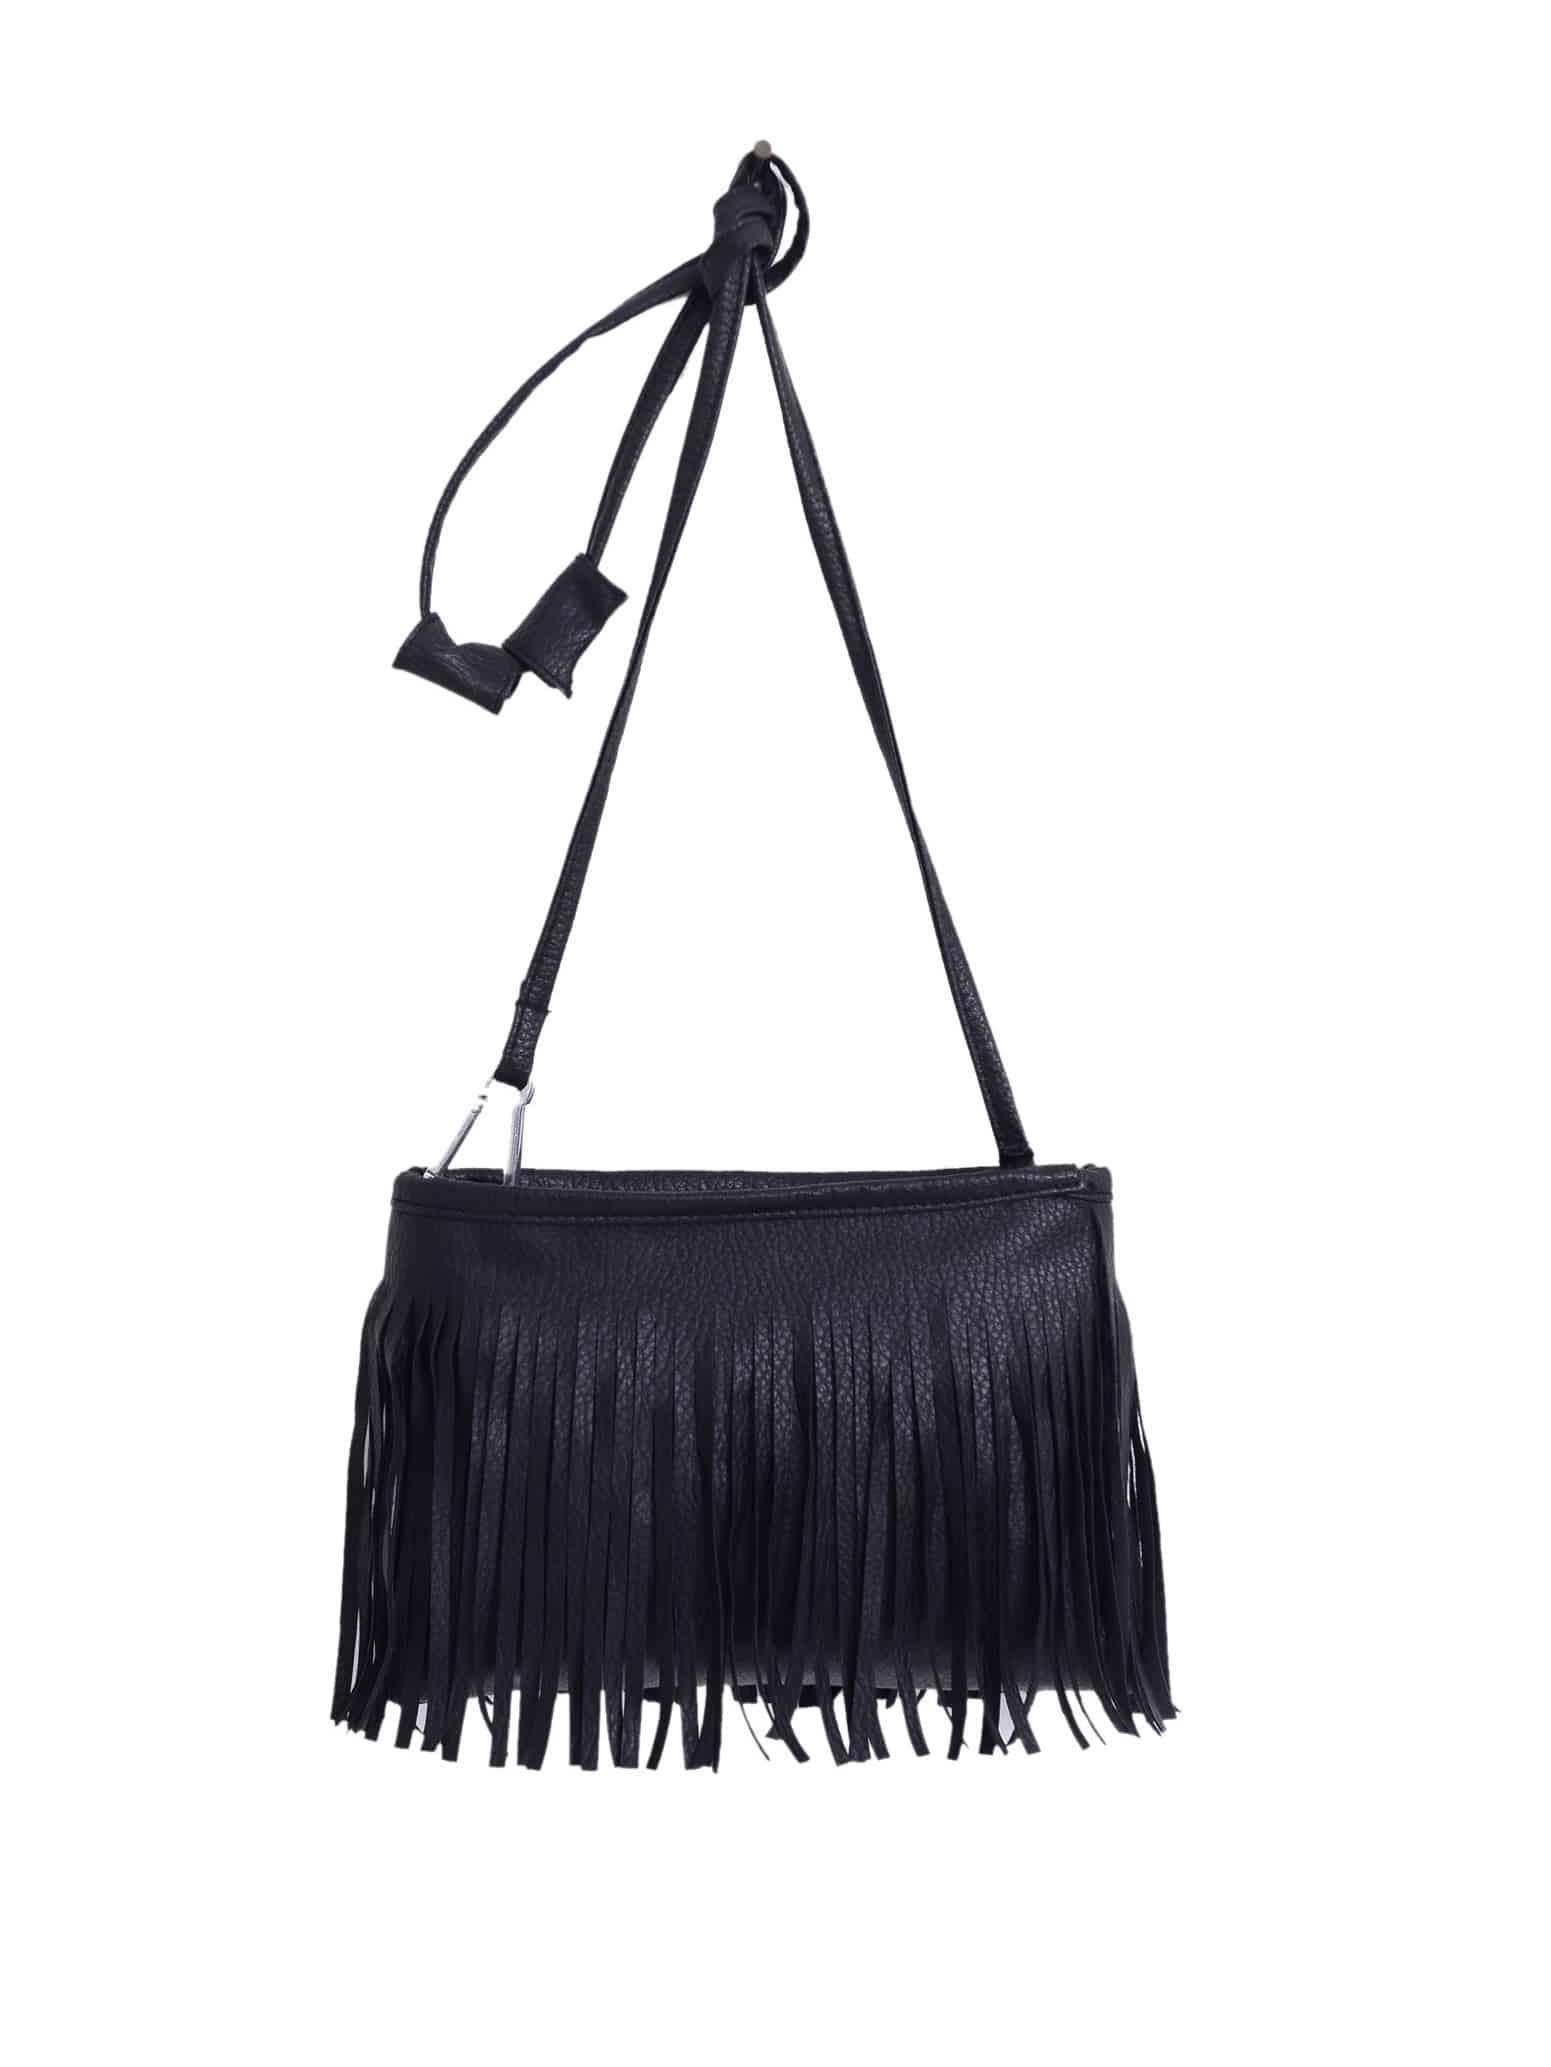 Фото Faux Leather Tassel Crossbody Bag - Black. Купить с доставкой